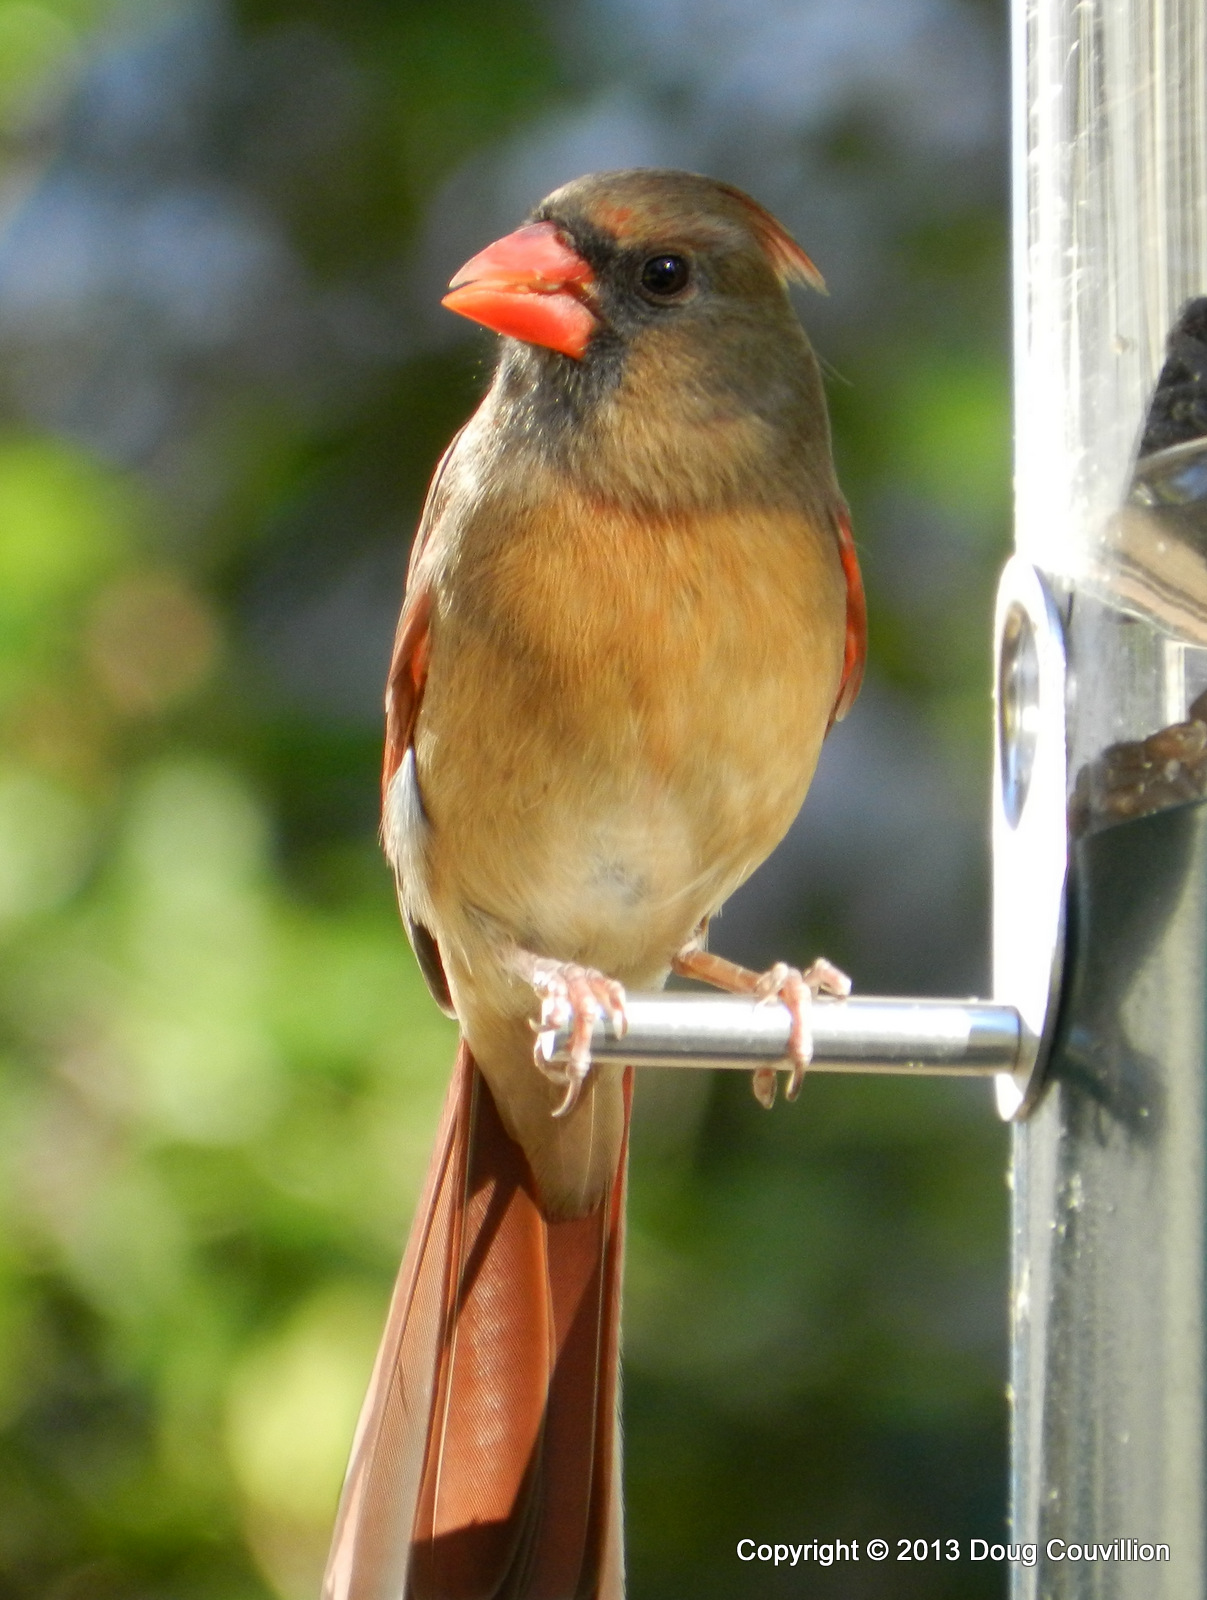 photograph of a female cardinal on a bird feeder